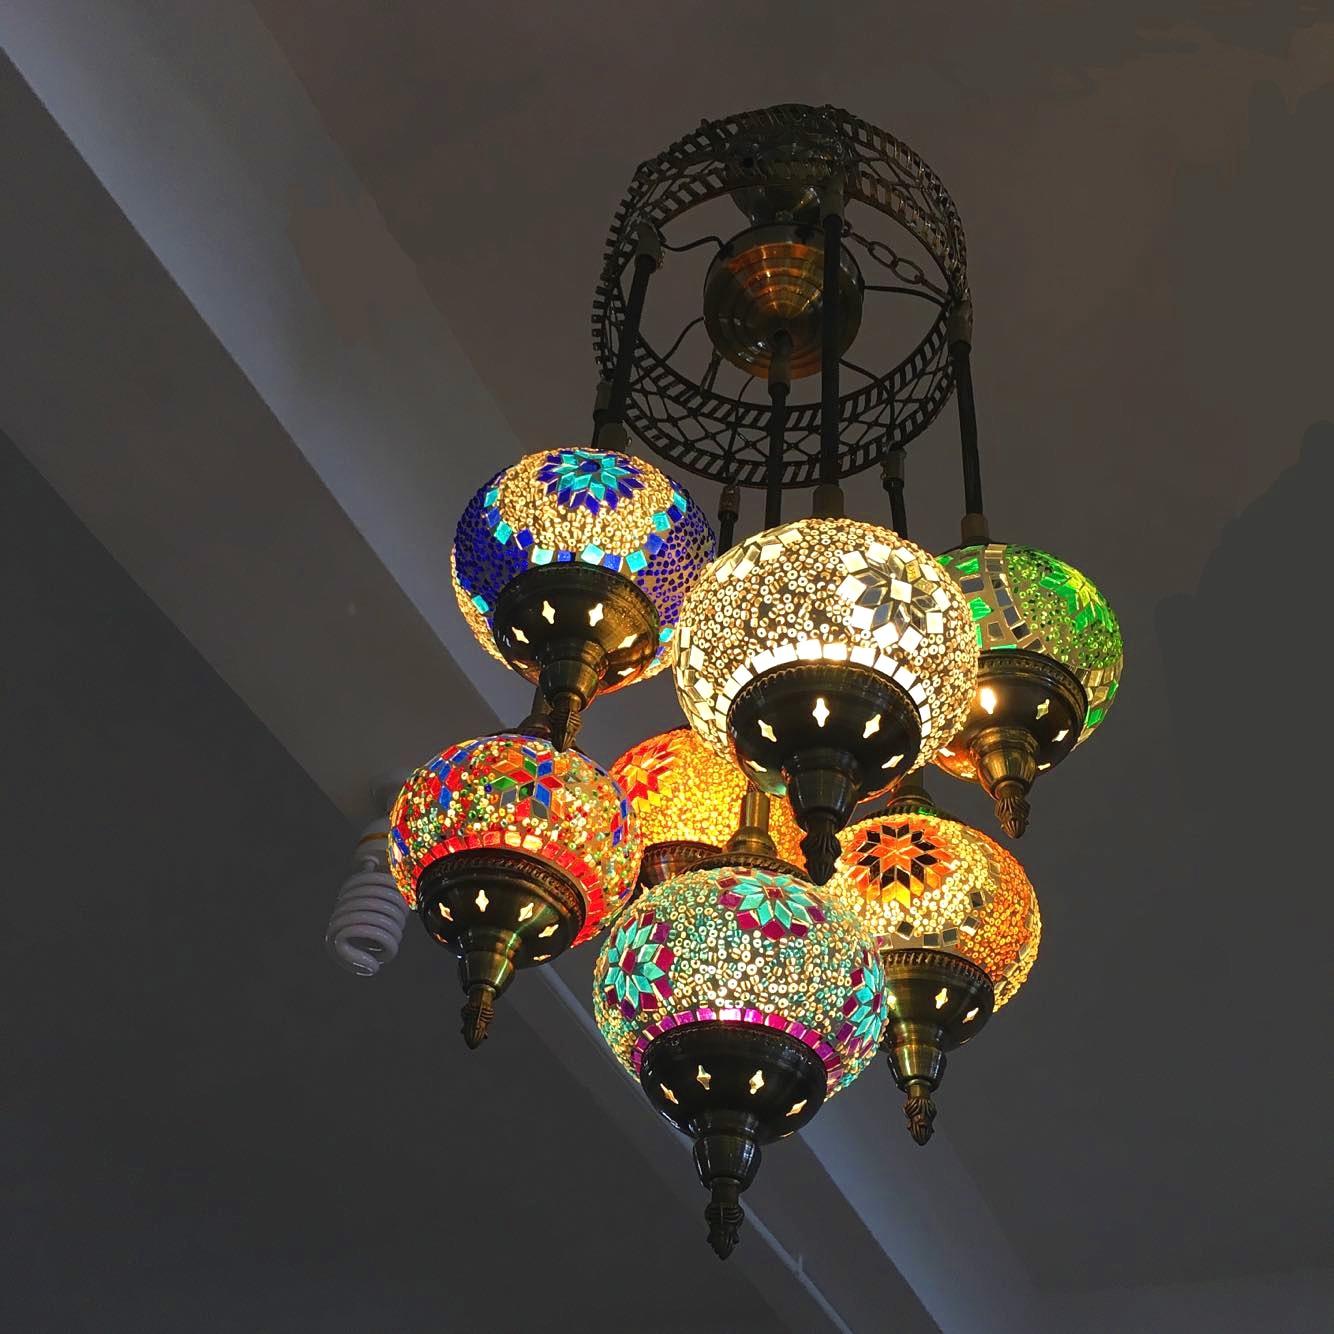 Turkish Moroccan Pendant Light Handmade Mosaic Stained Glass Corridor Stairwell Cafe Restaurant Hanging Light Lamp